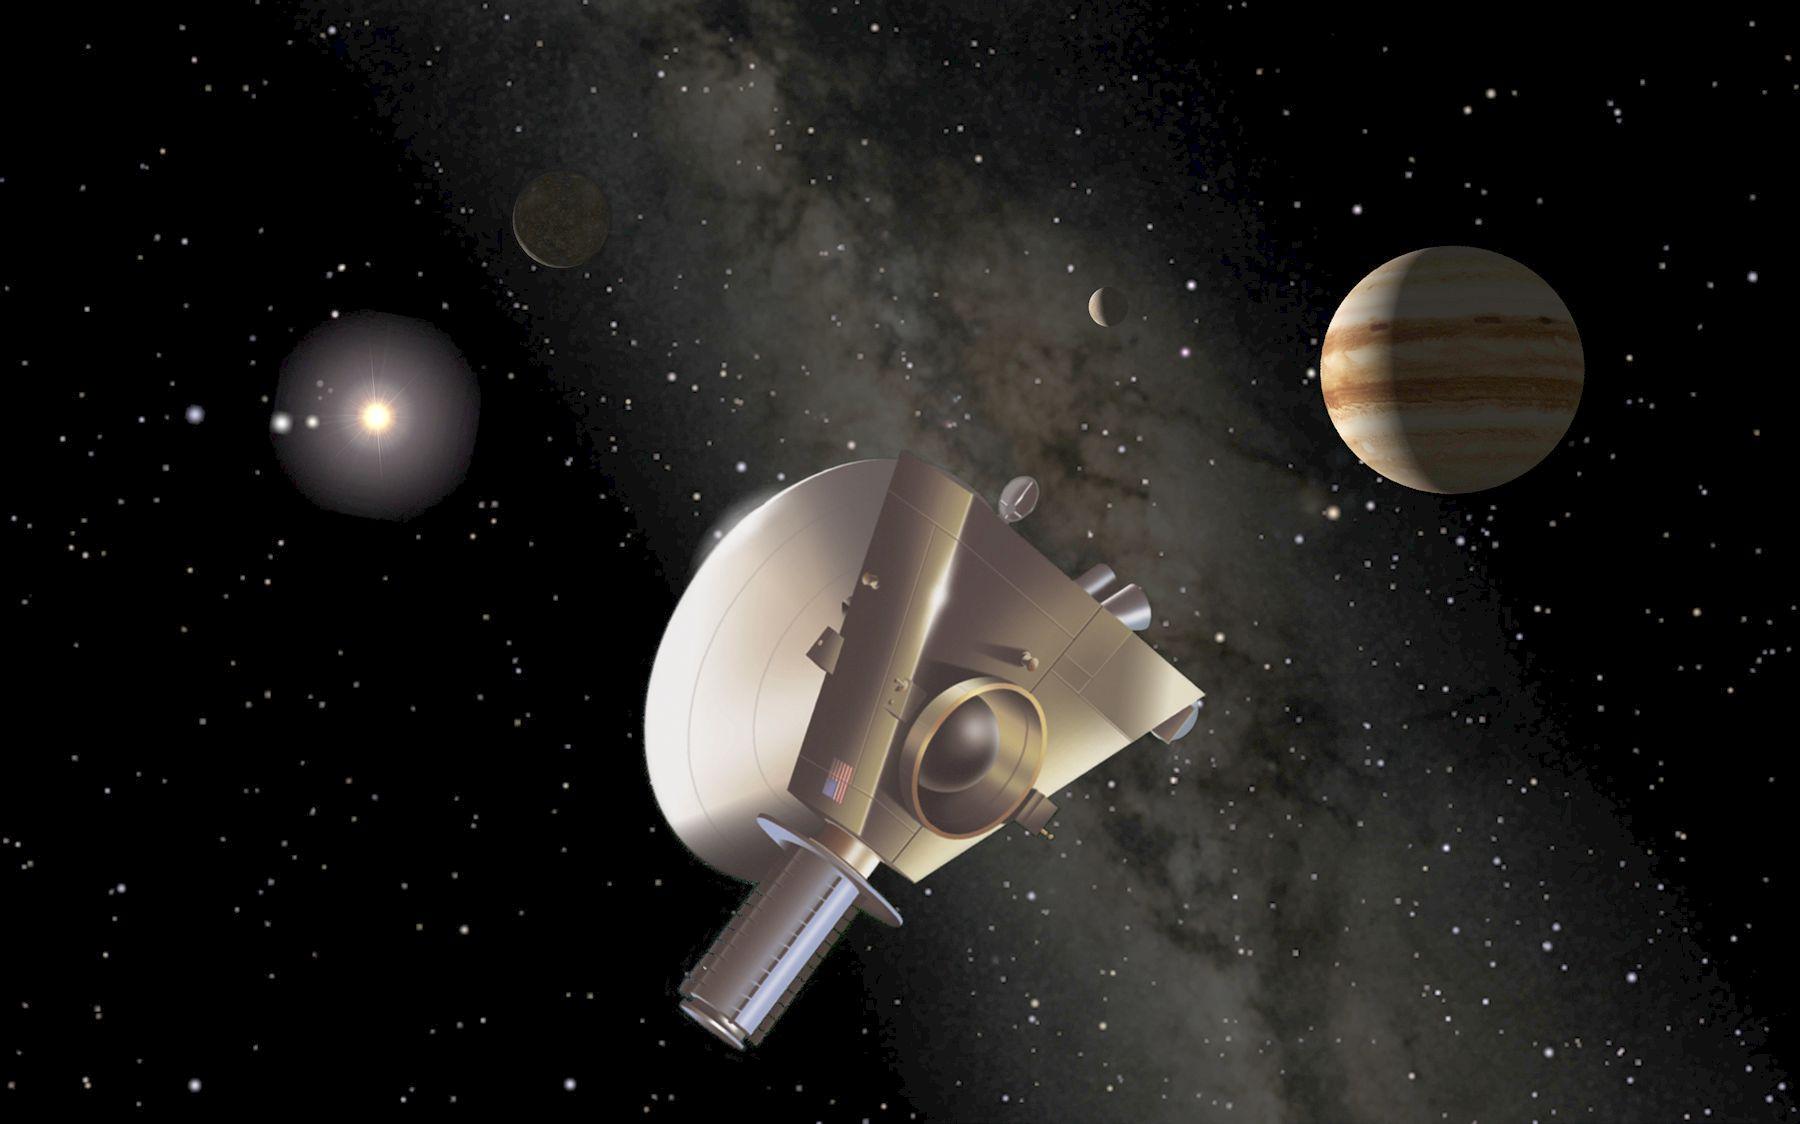 APOD: 2003 December 4 - New Horizons at Jupiter